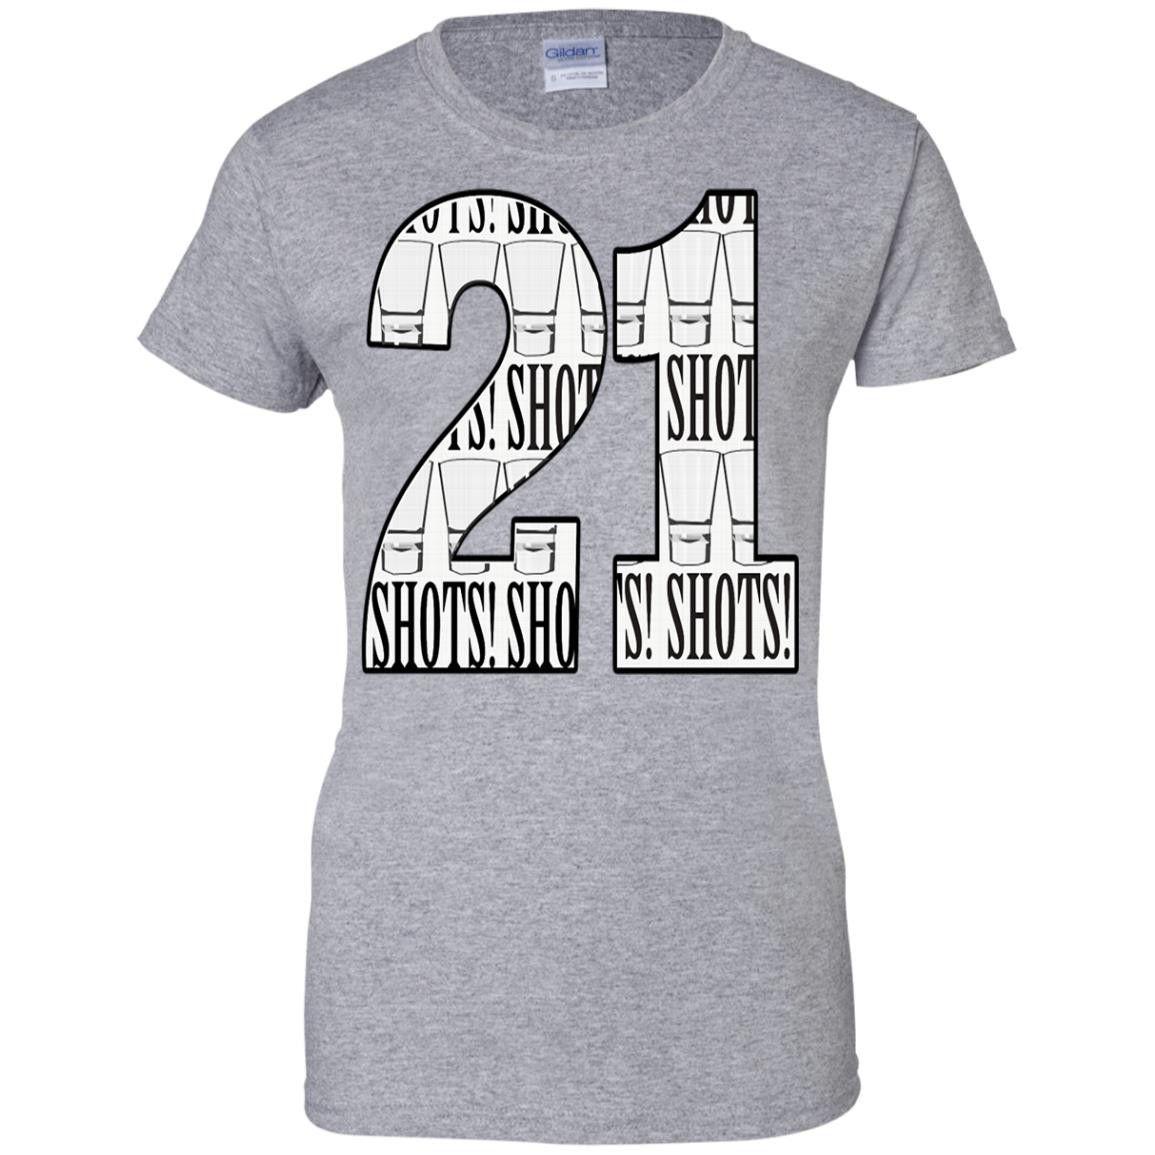 21 SHOTS WOMENS VNECK G200L Gildan Ladies' 100% Cotton T-Shirt